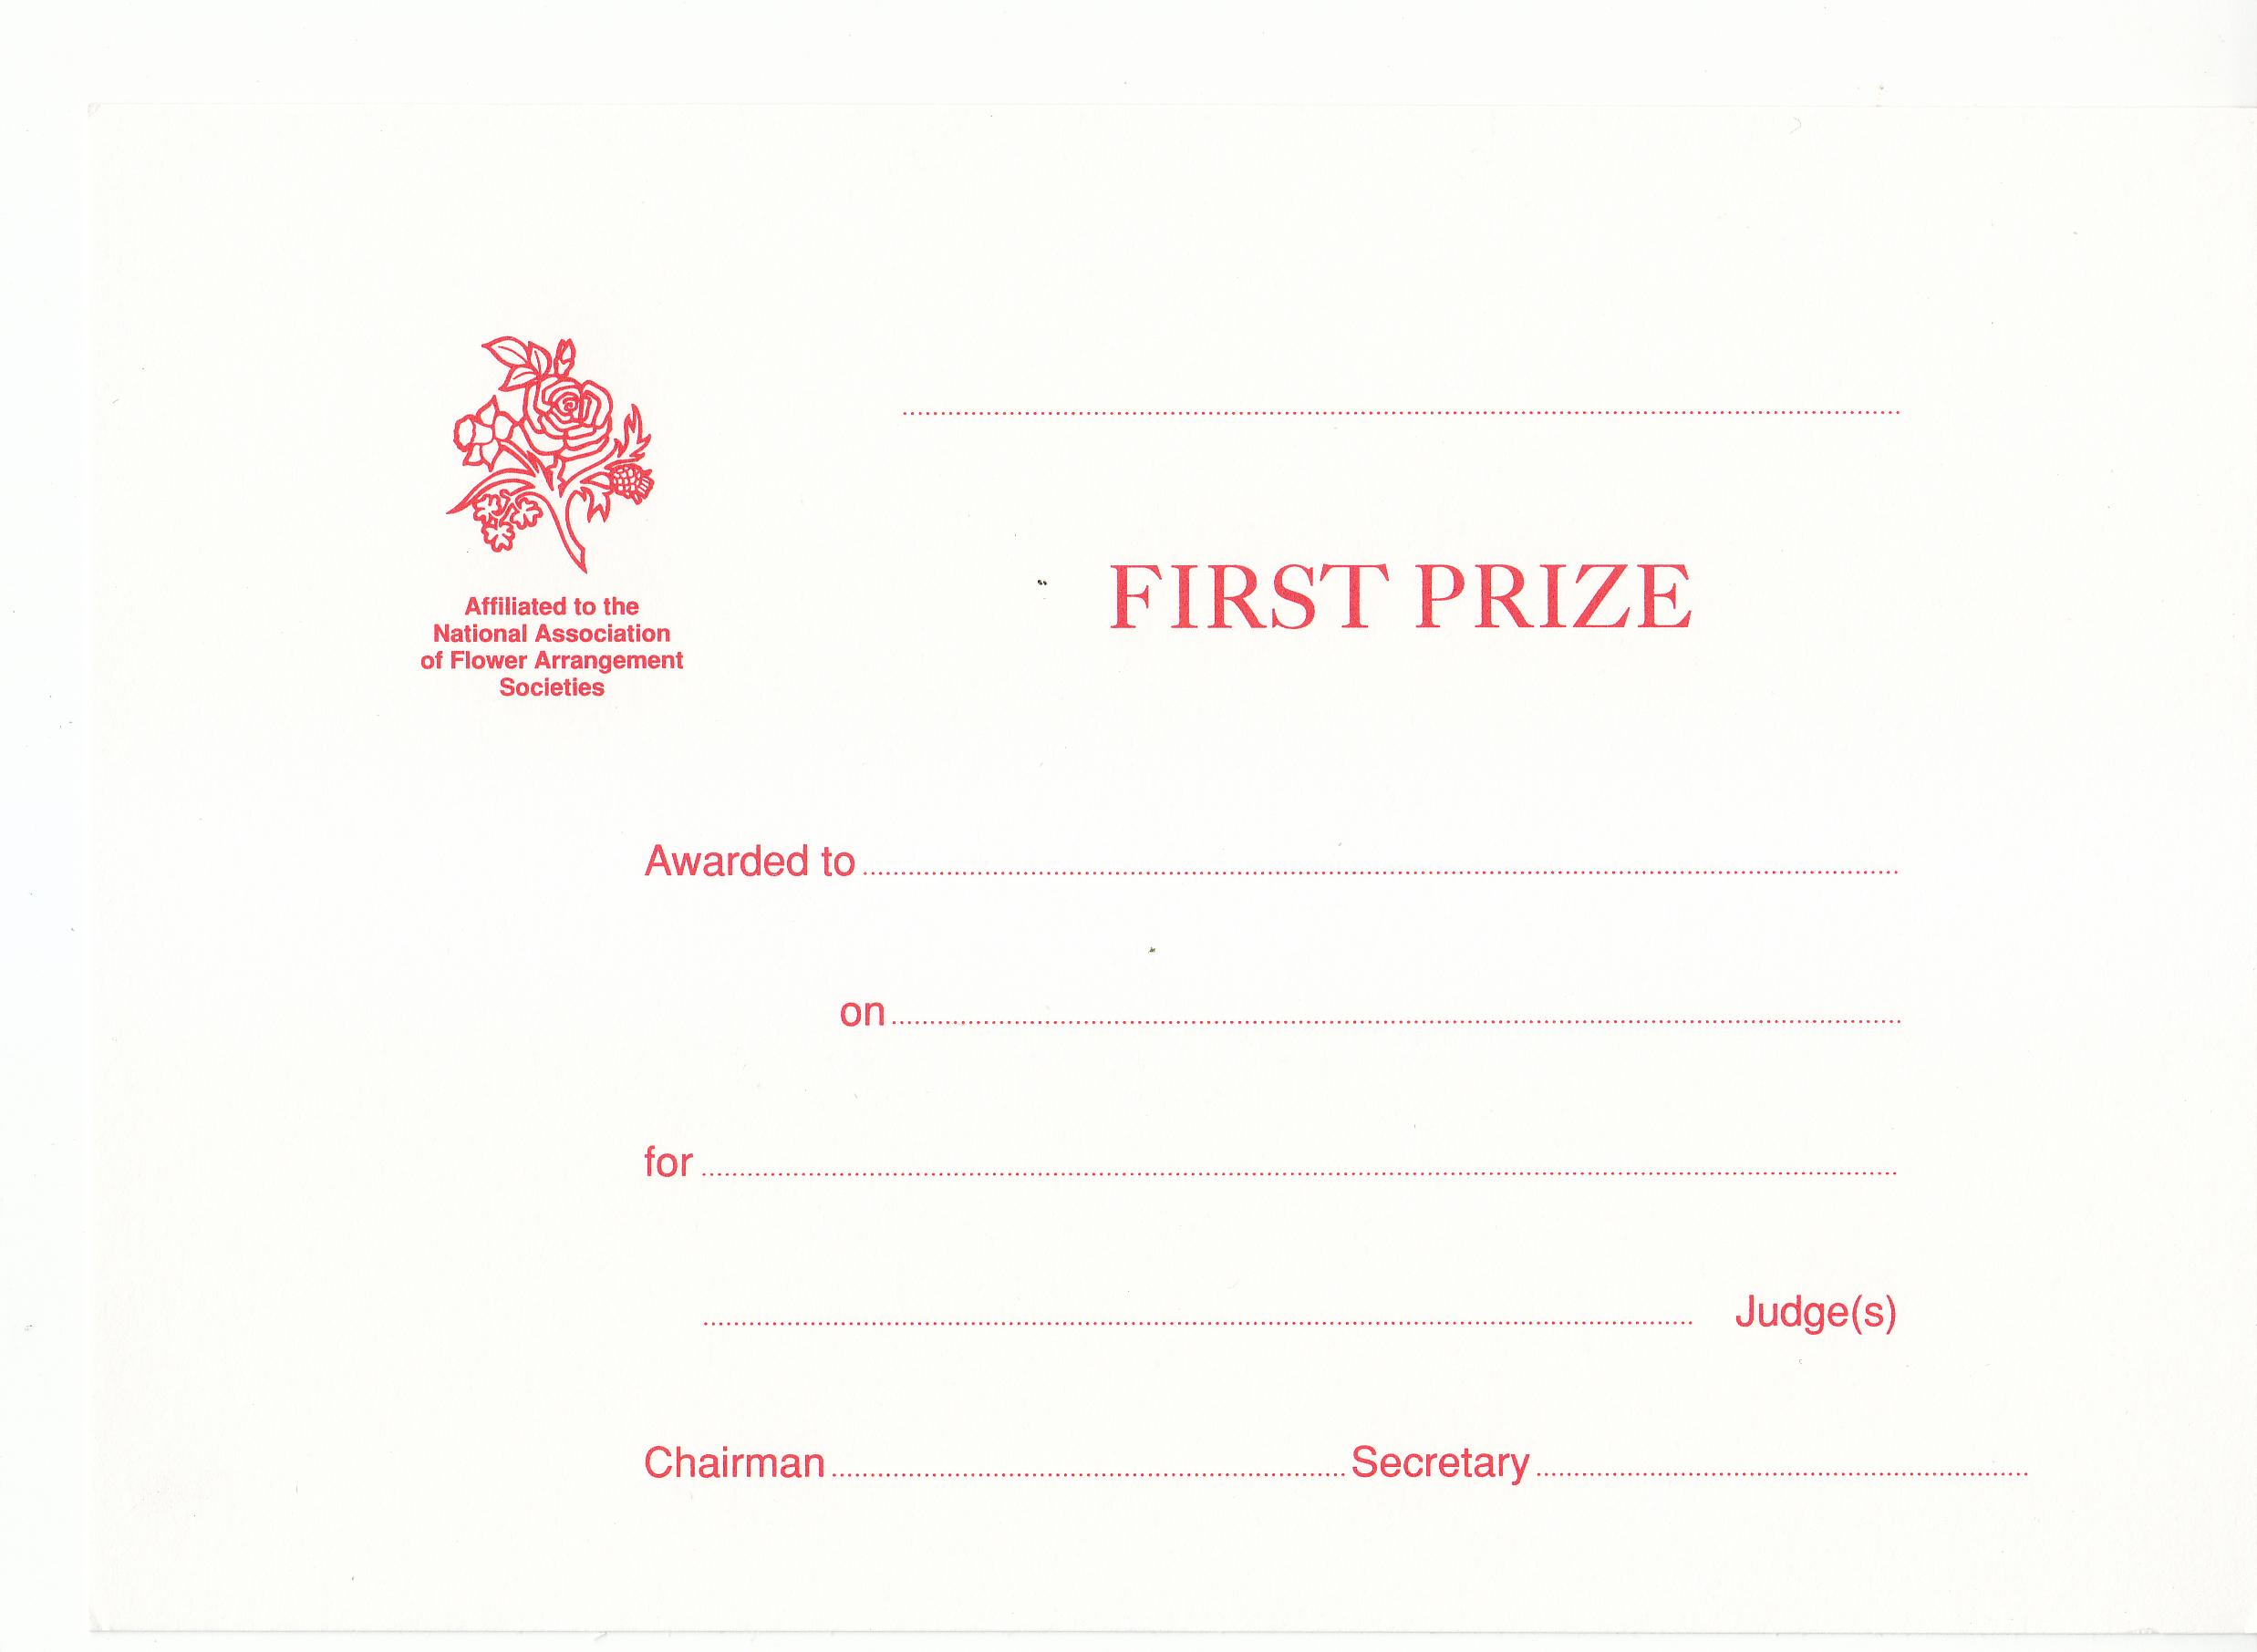 EAW002 1st Prize Award